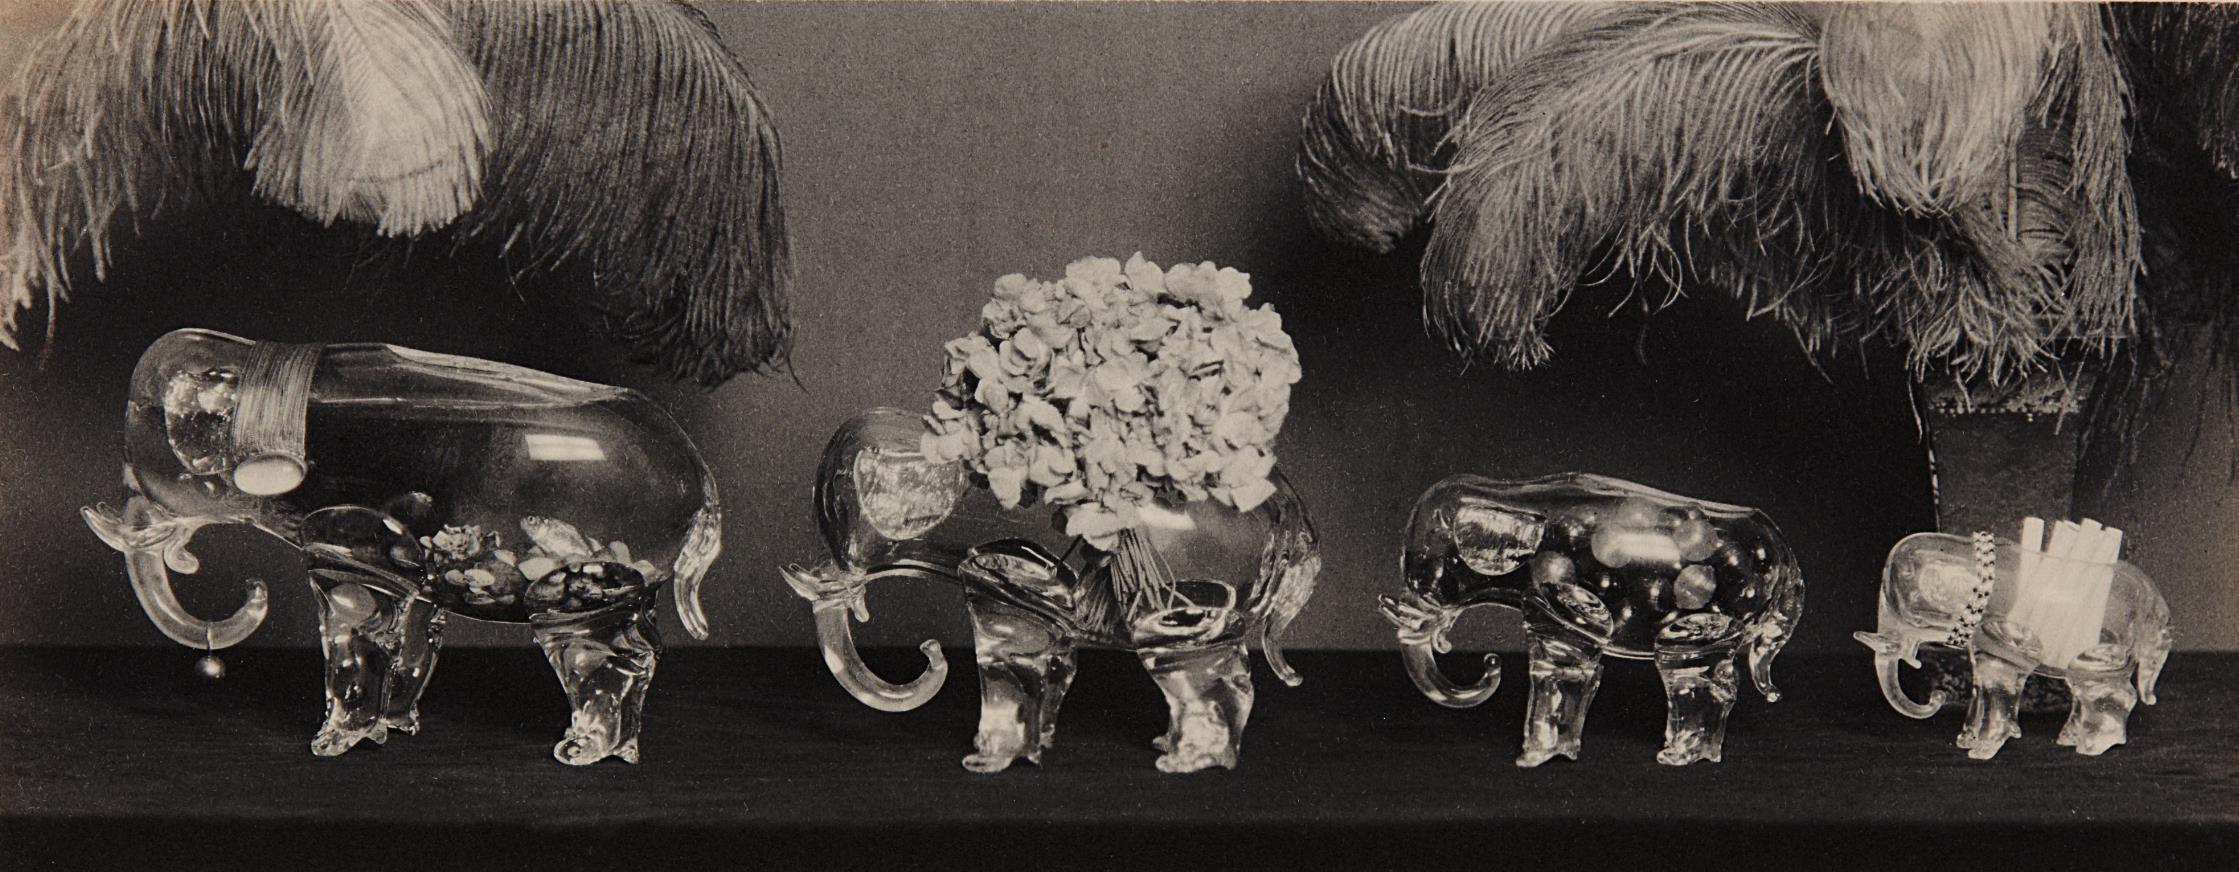 Paul Outerbridge-Four Glass Elephants-1924